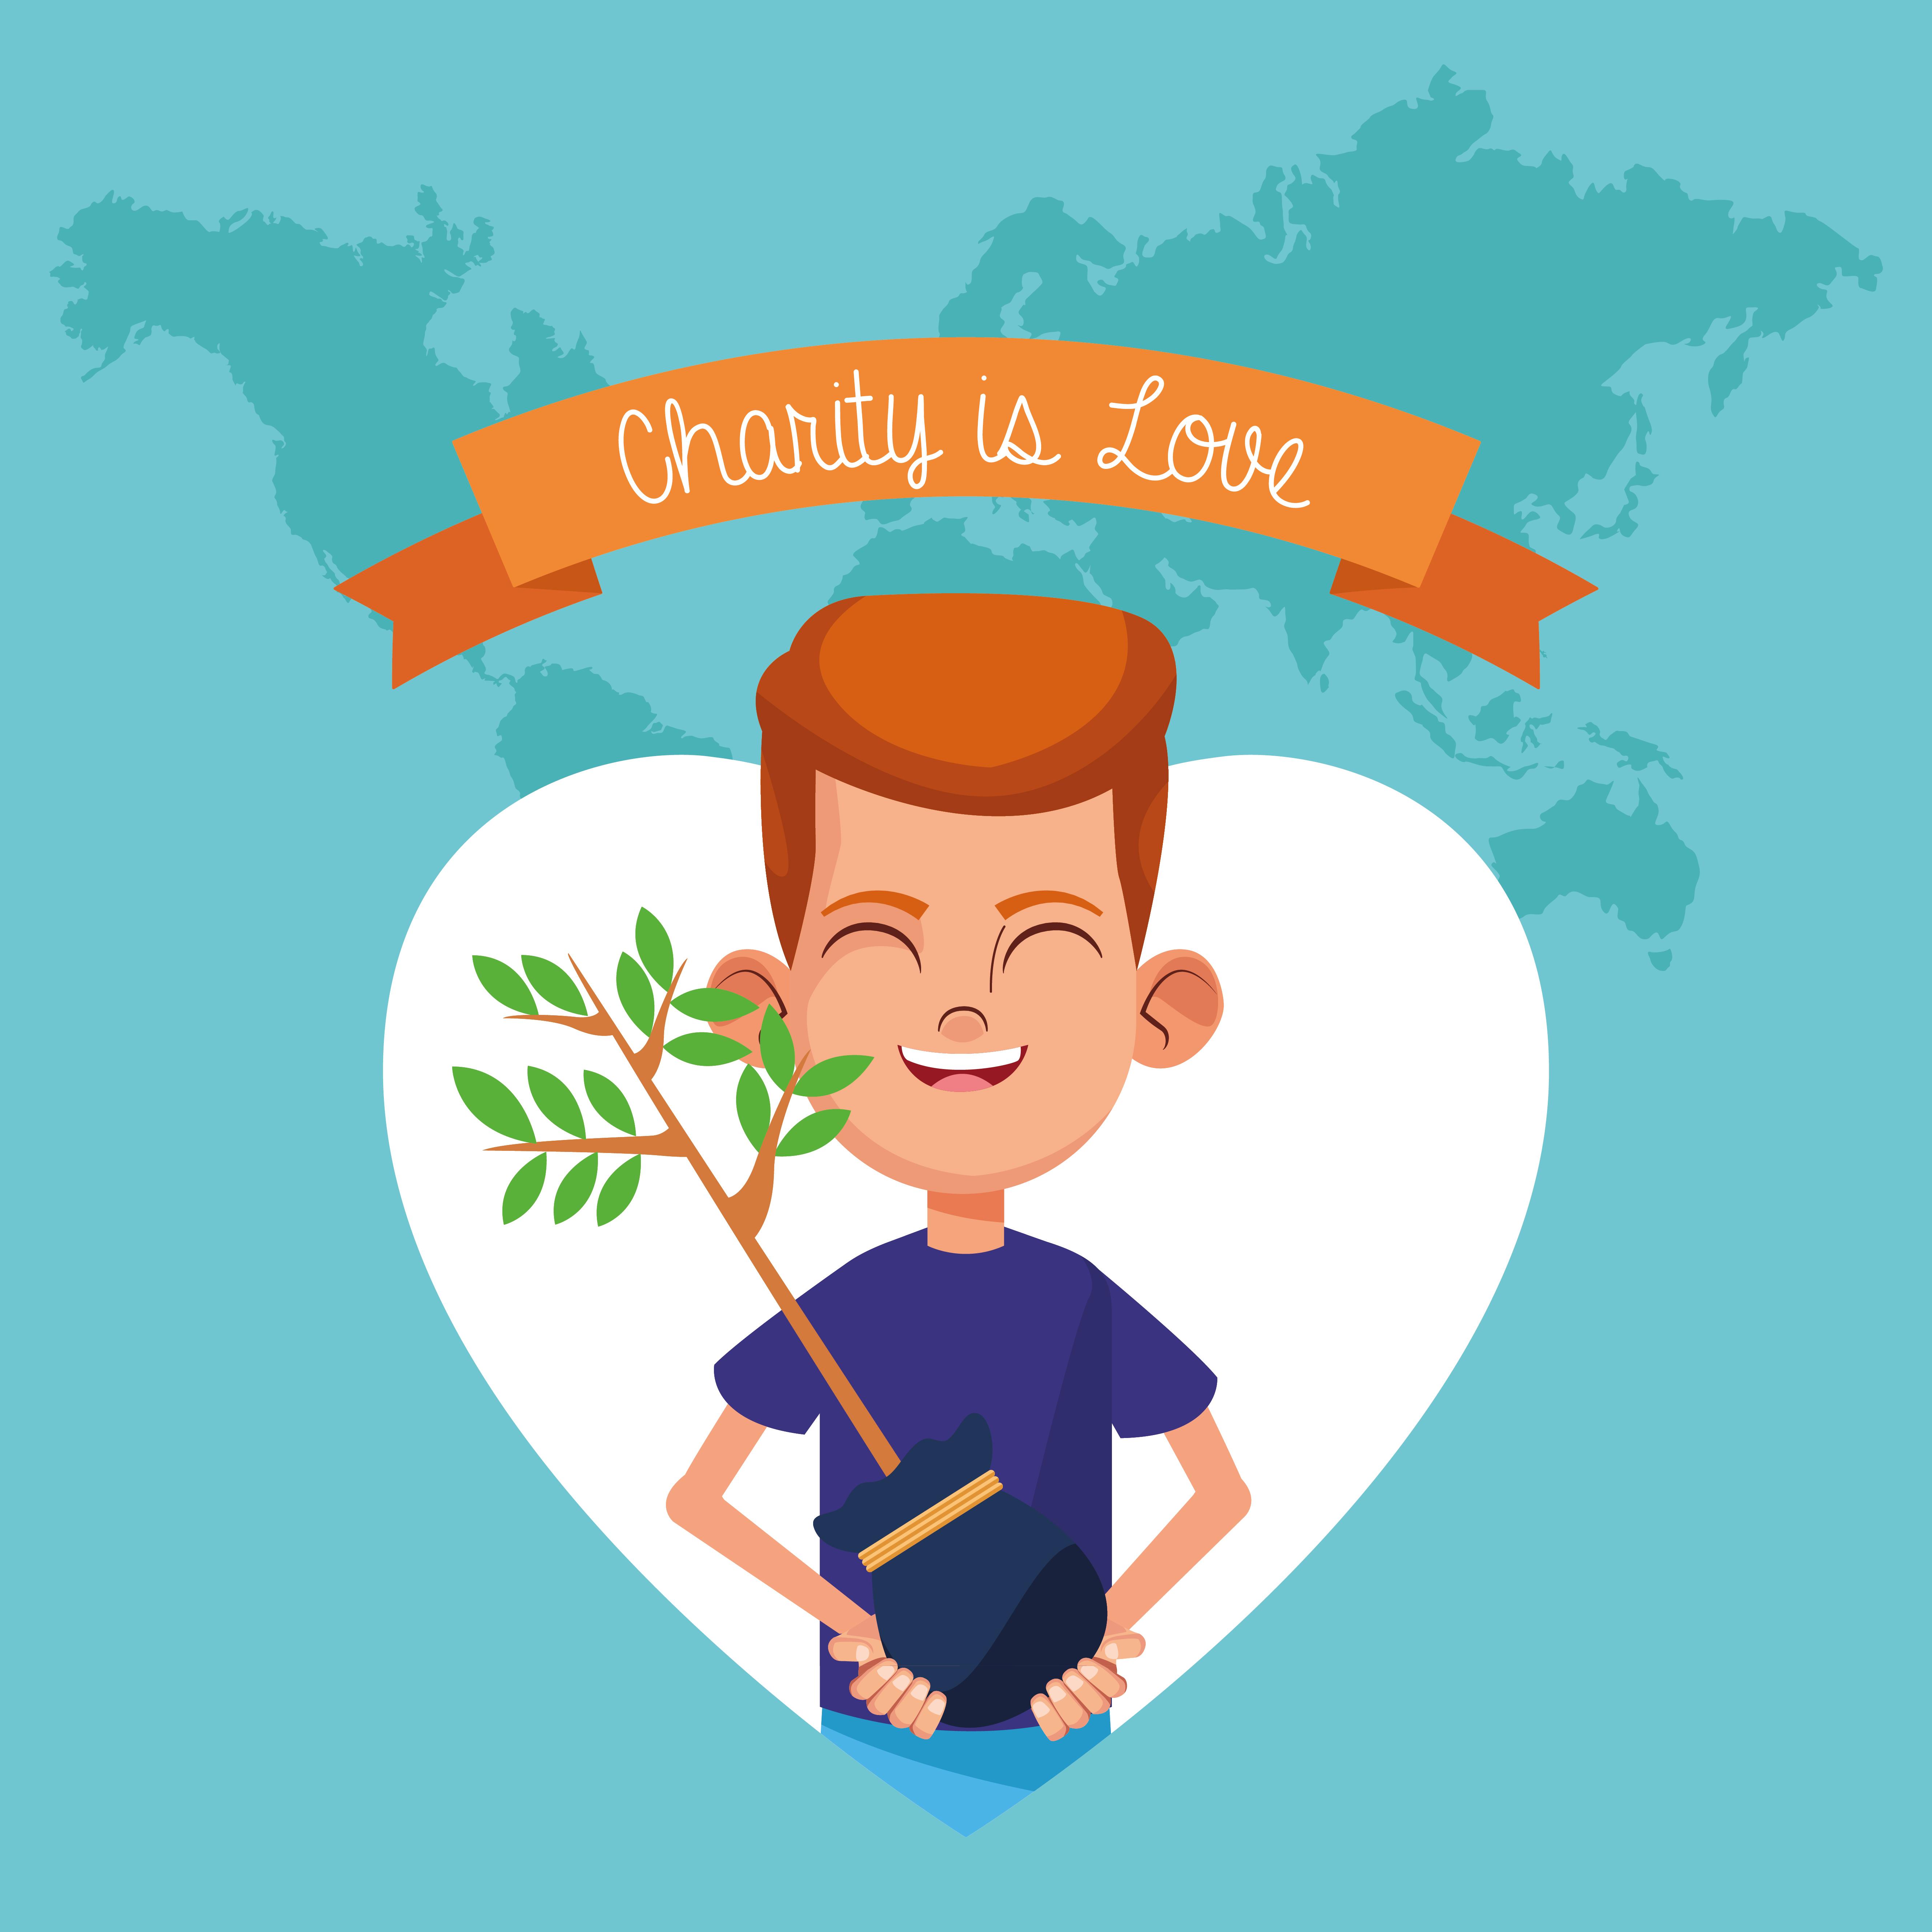 Charity Is Love Cartoon 657331 Vector Art At Vecteezy